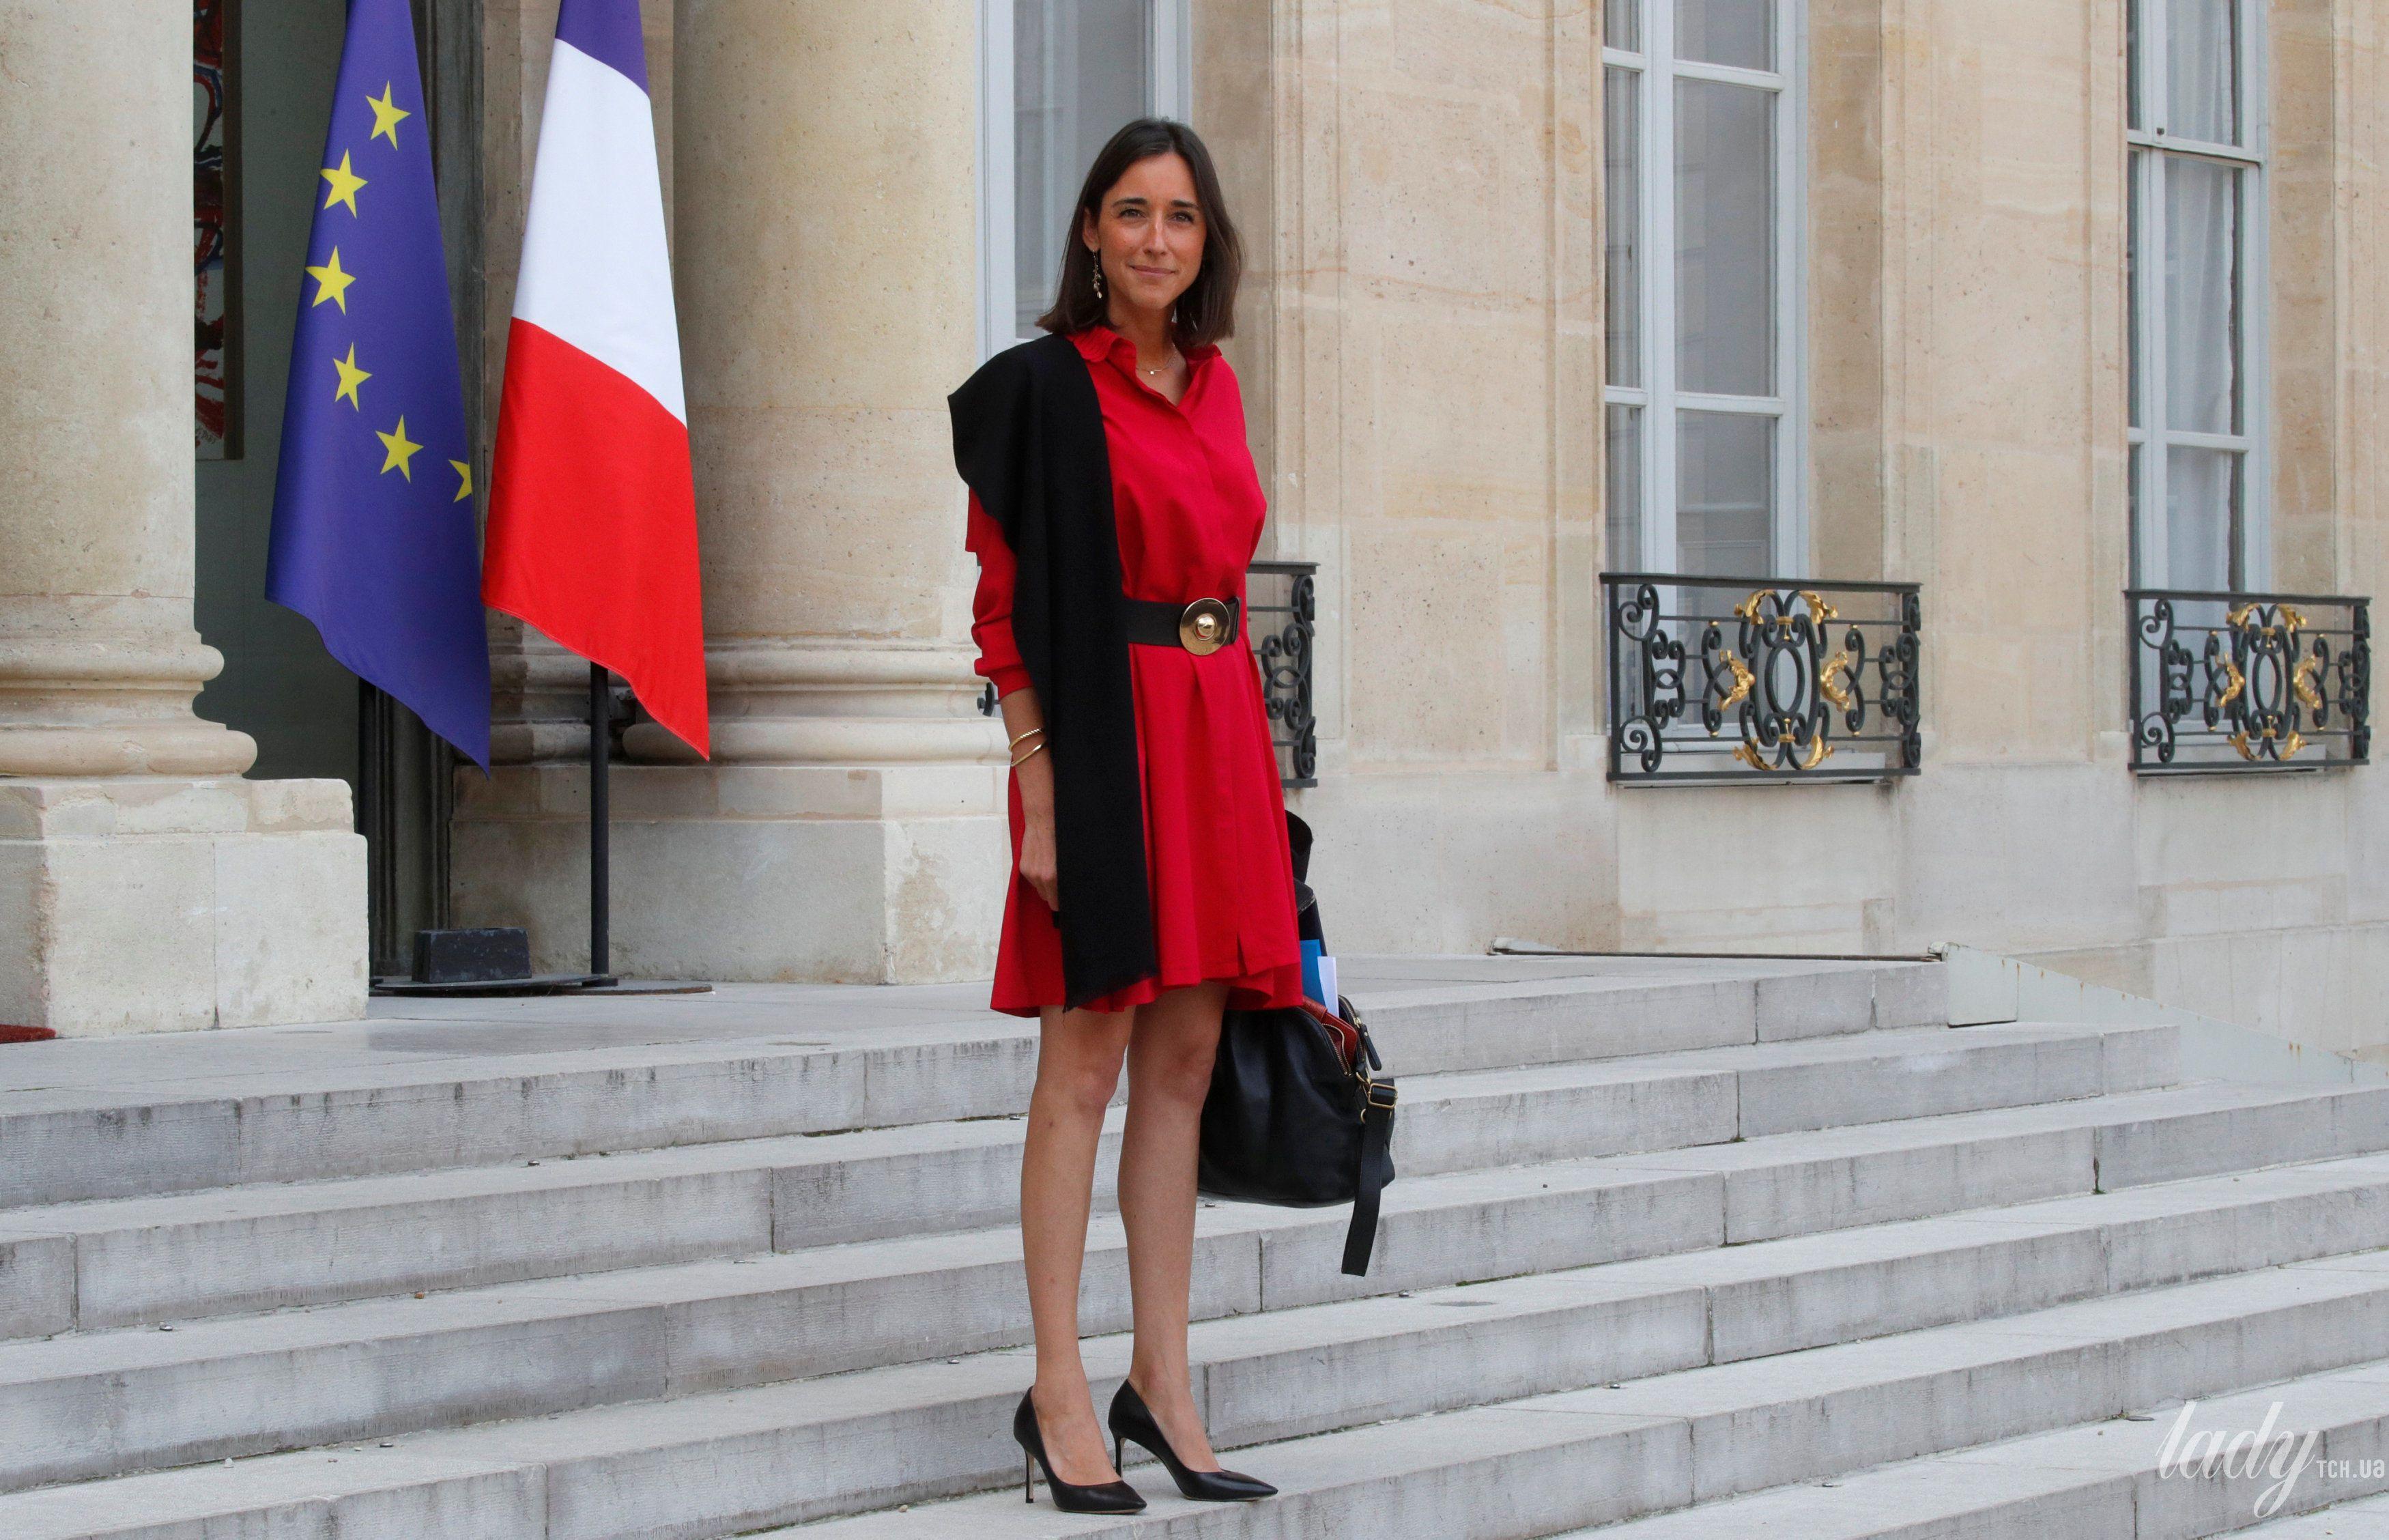 Младший министр экологии Франции Брун Пойрсон